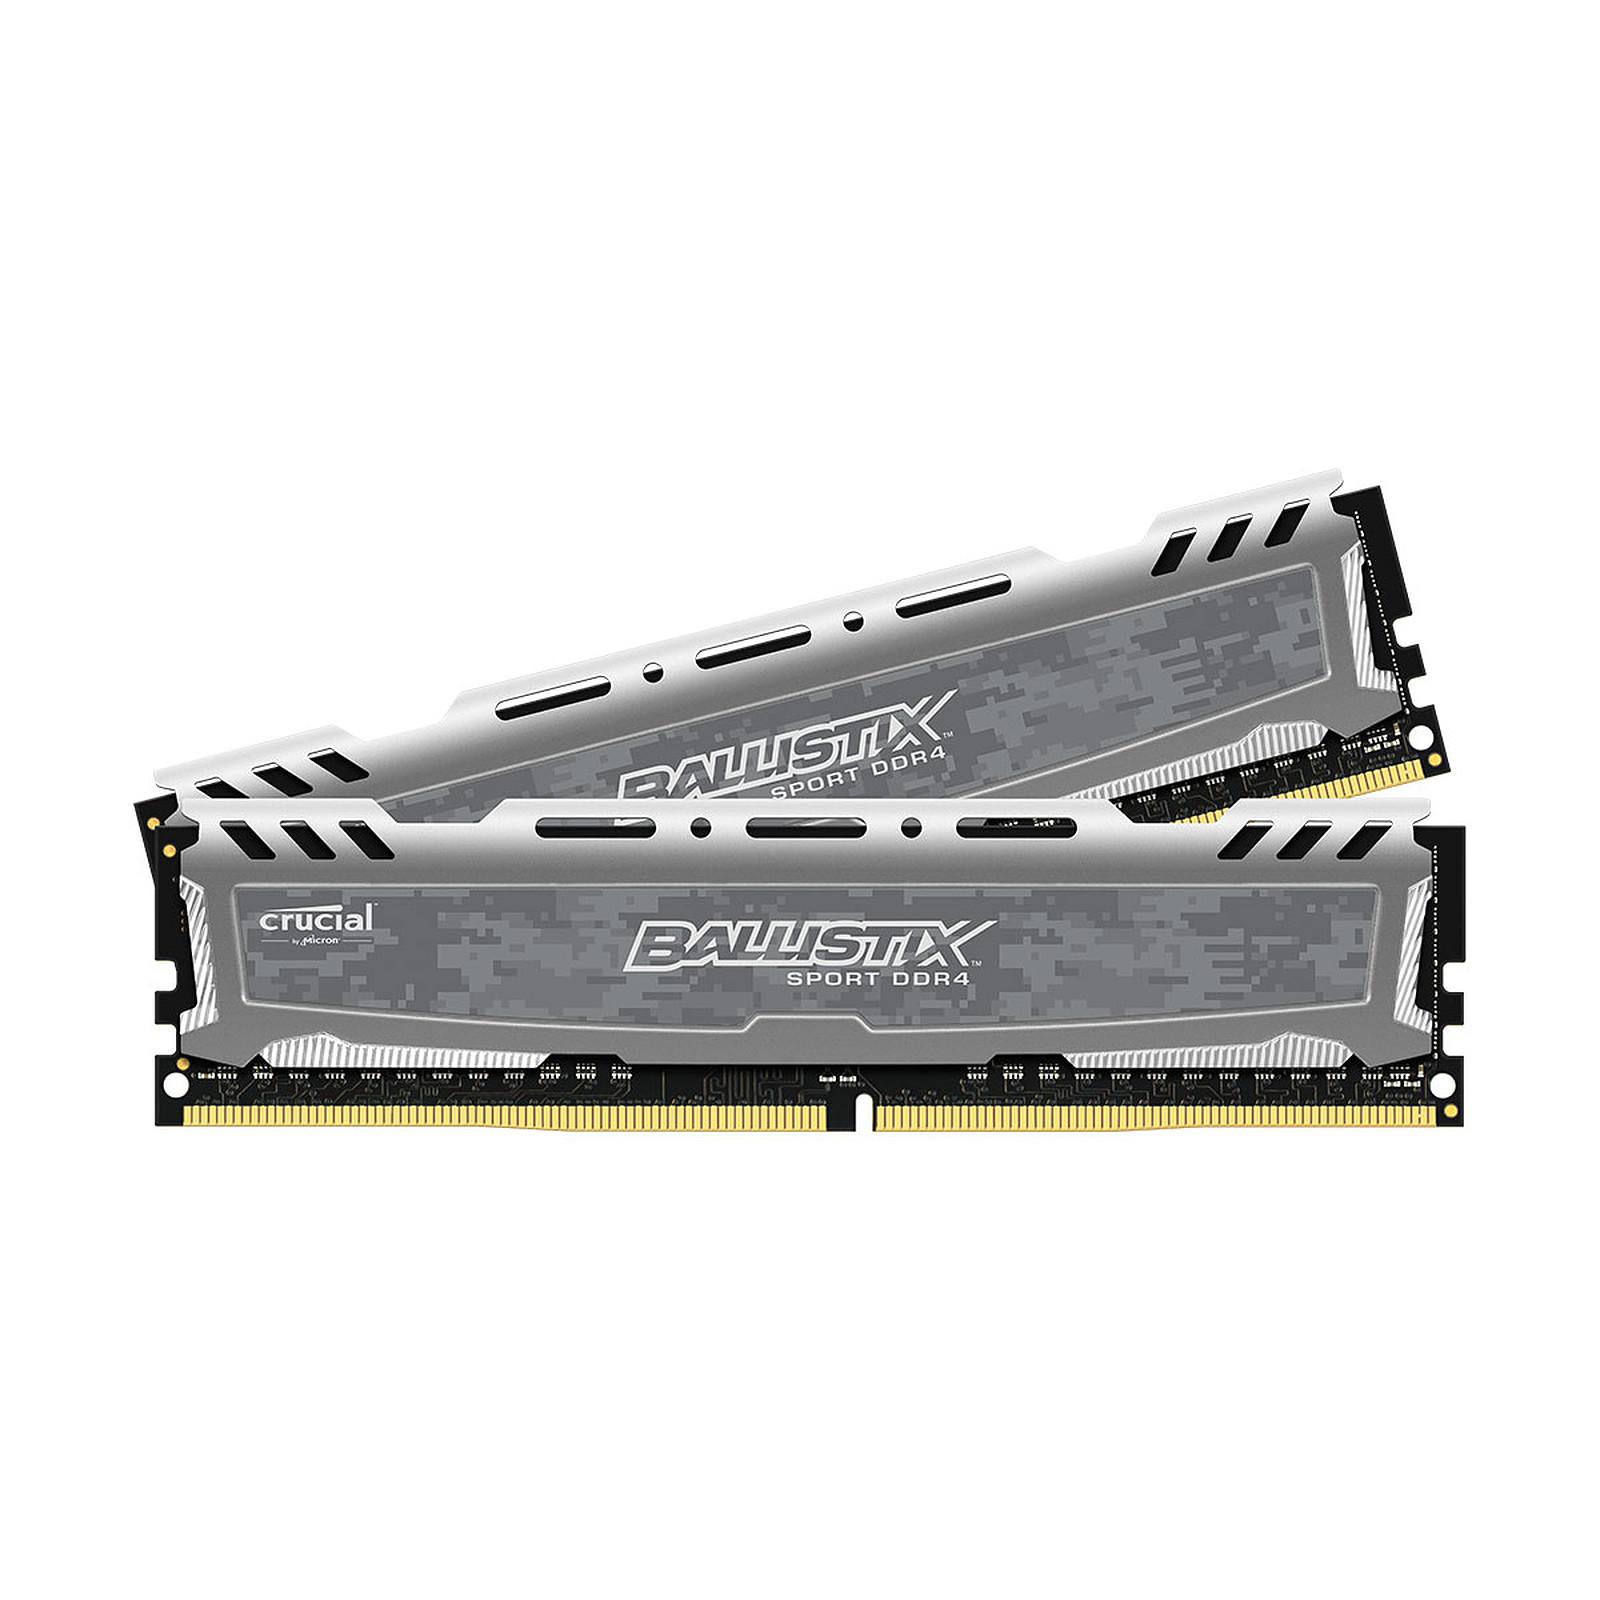 Ballistix Sport 8 Go (2 x 4 Go) DDR4 2666 MHz CL16